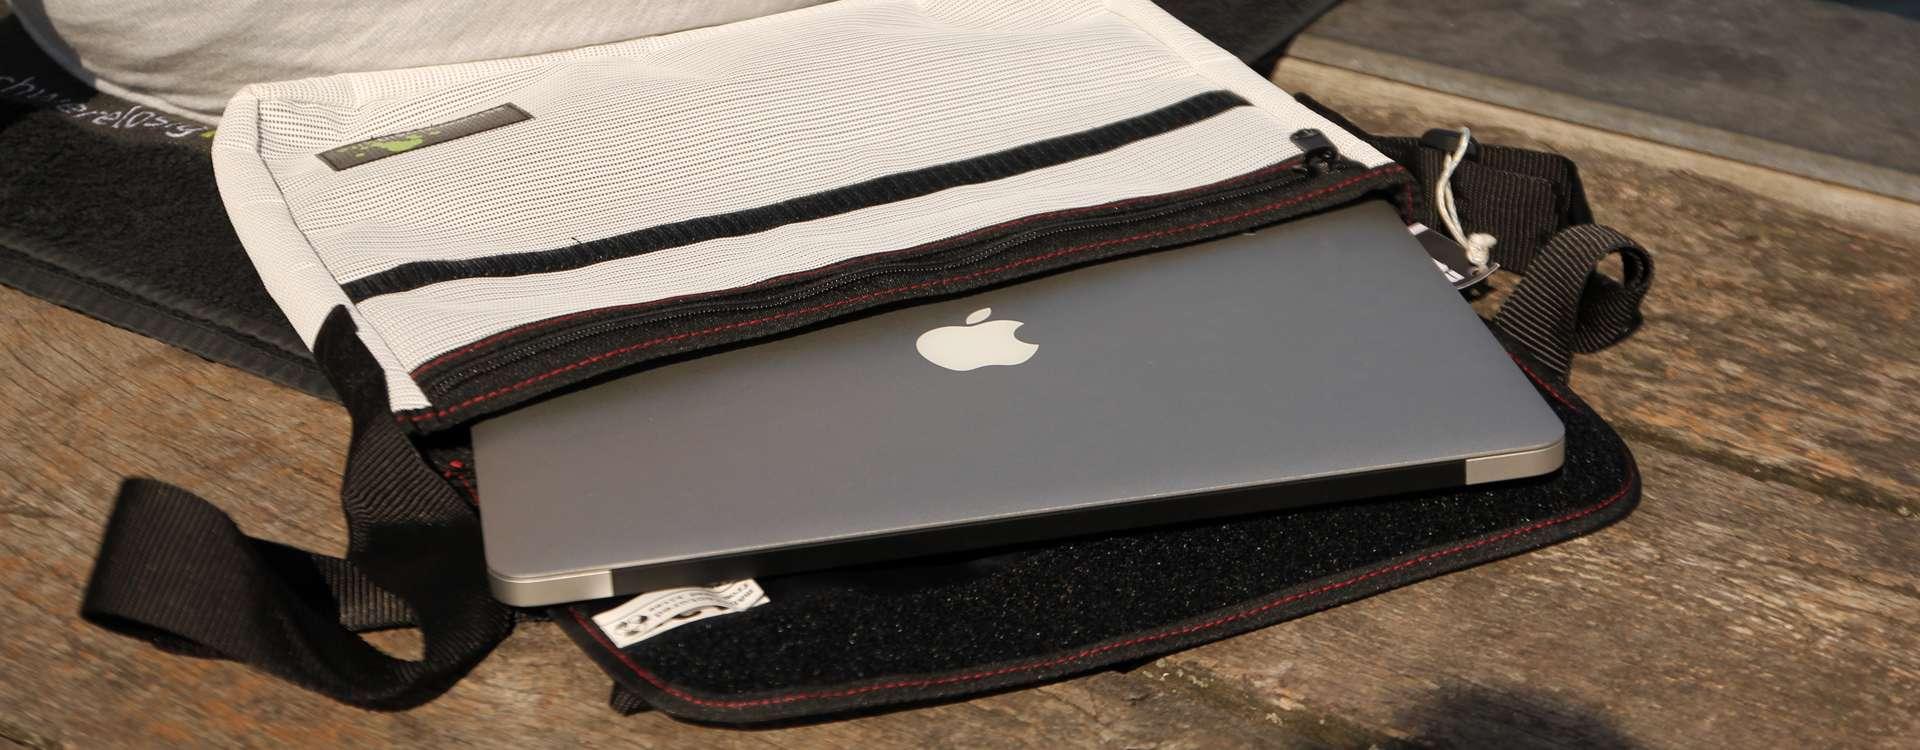 Laptop & Tablet